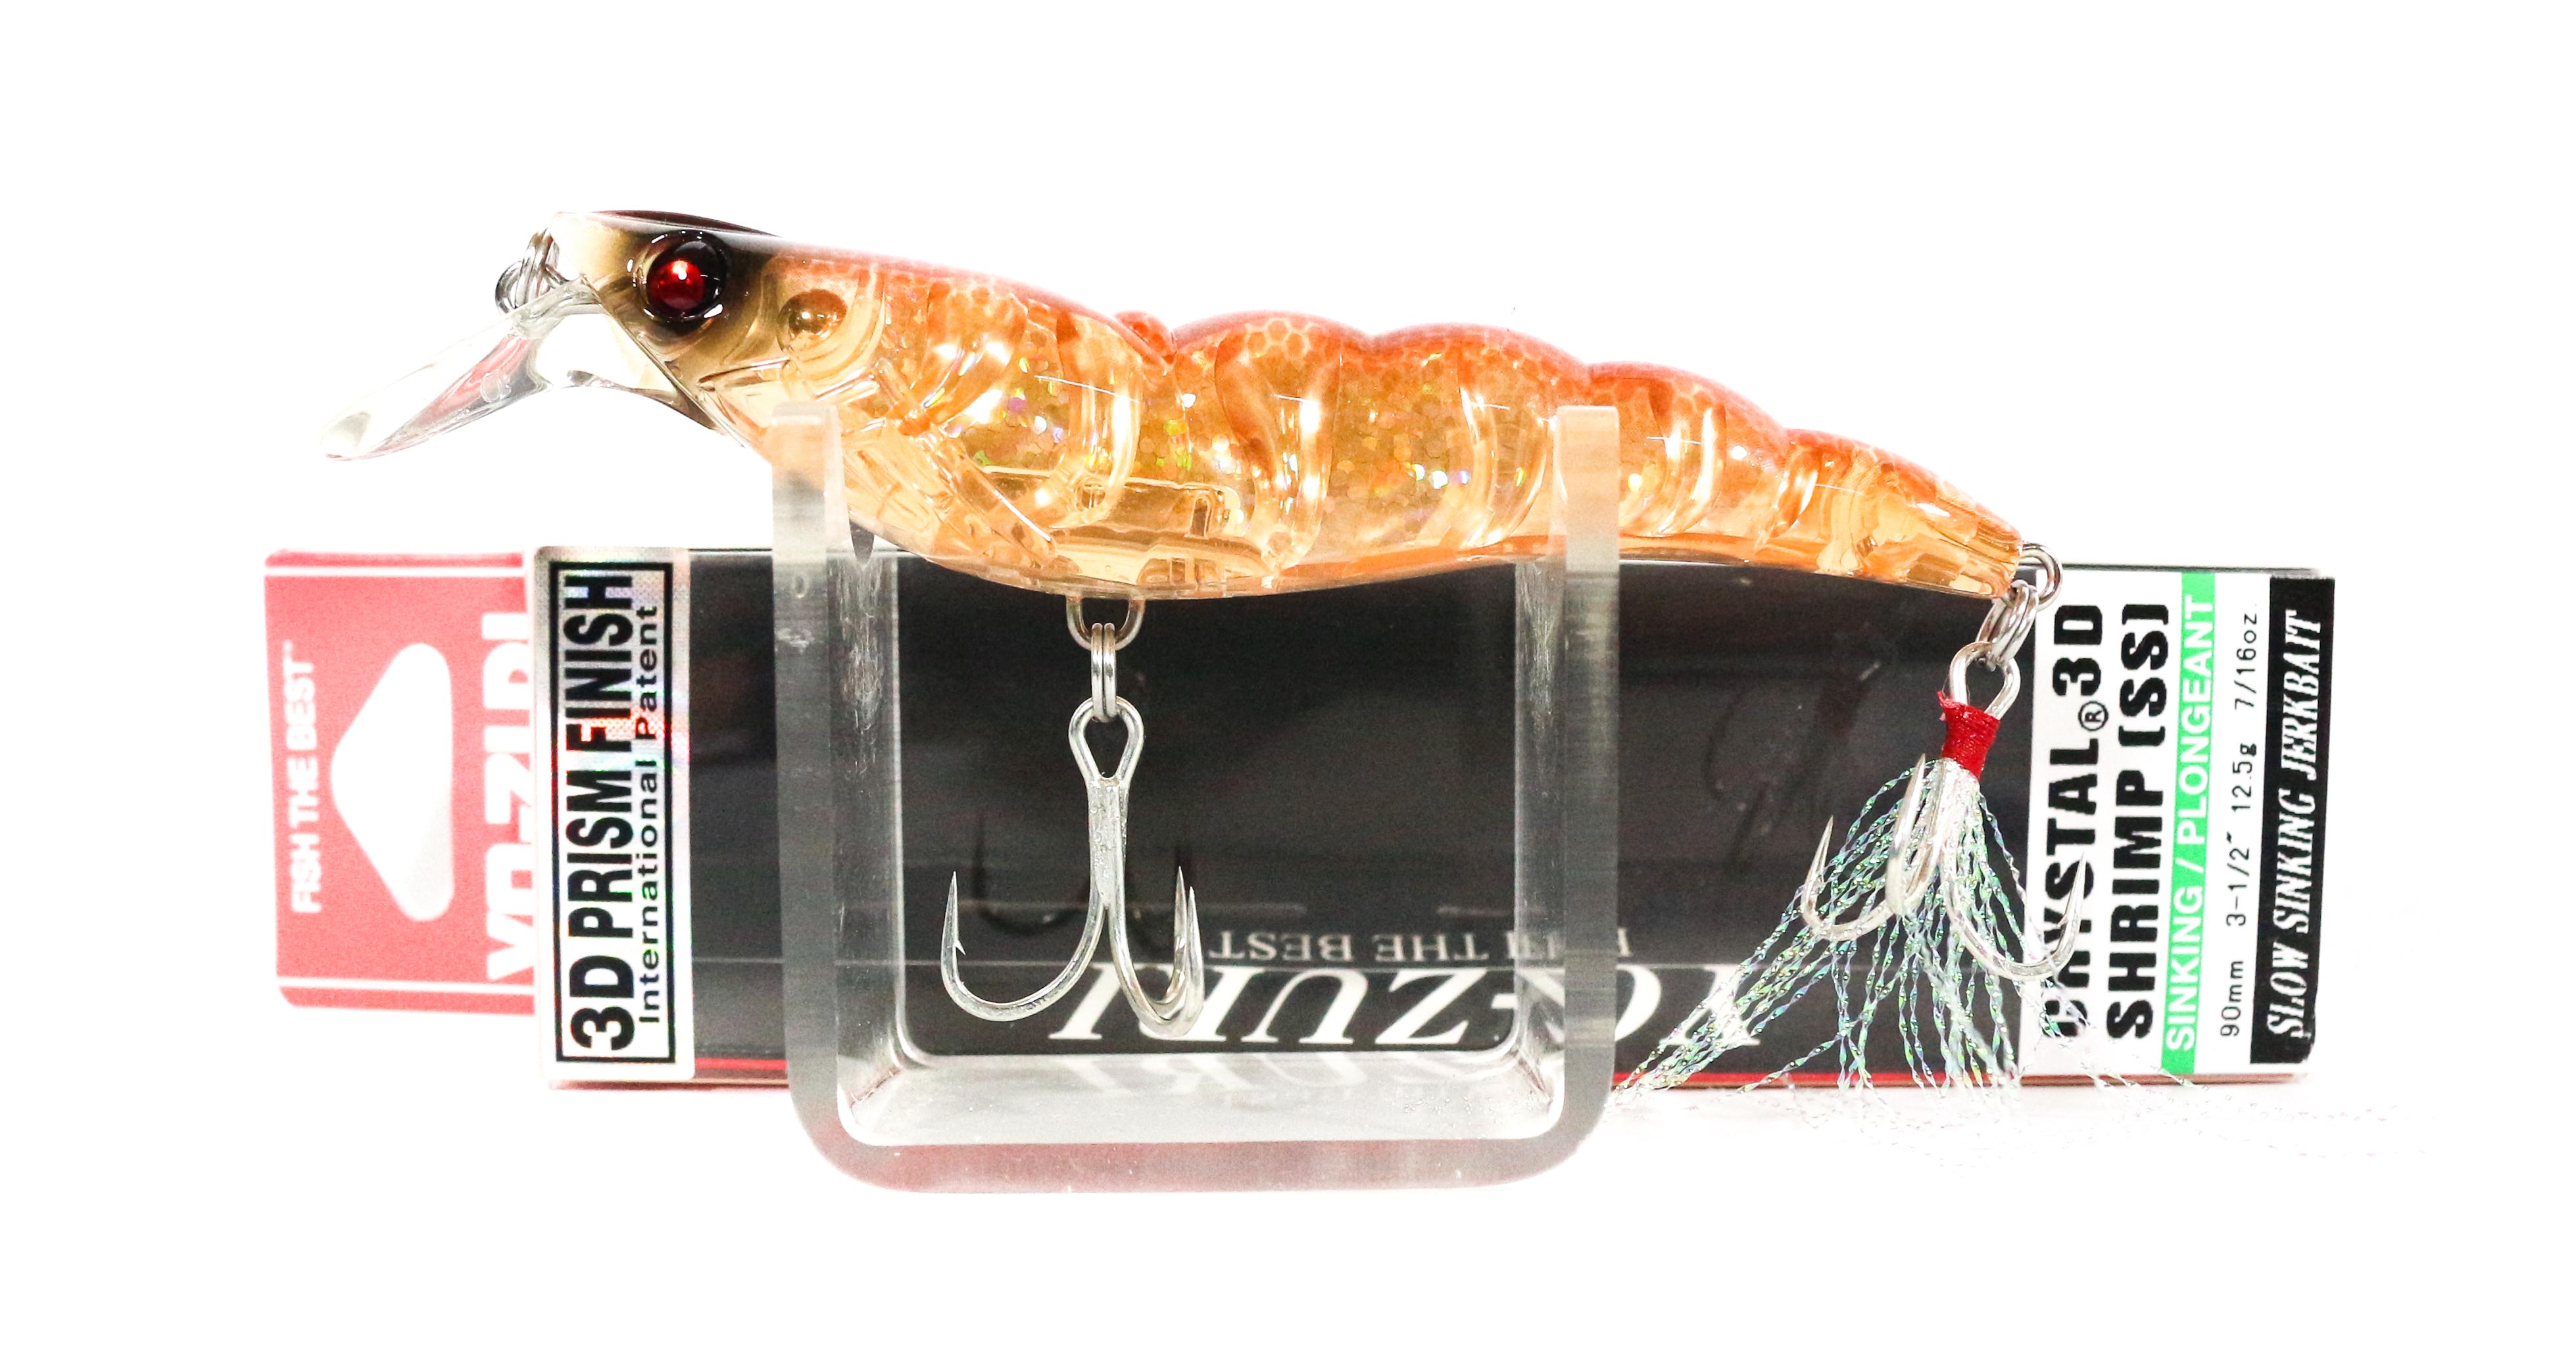 2530 Yo Zuri 3D Crystal Shrimp 70 mm Sinking Lure R1161-HTS